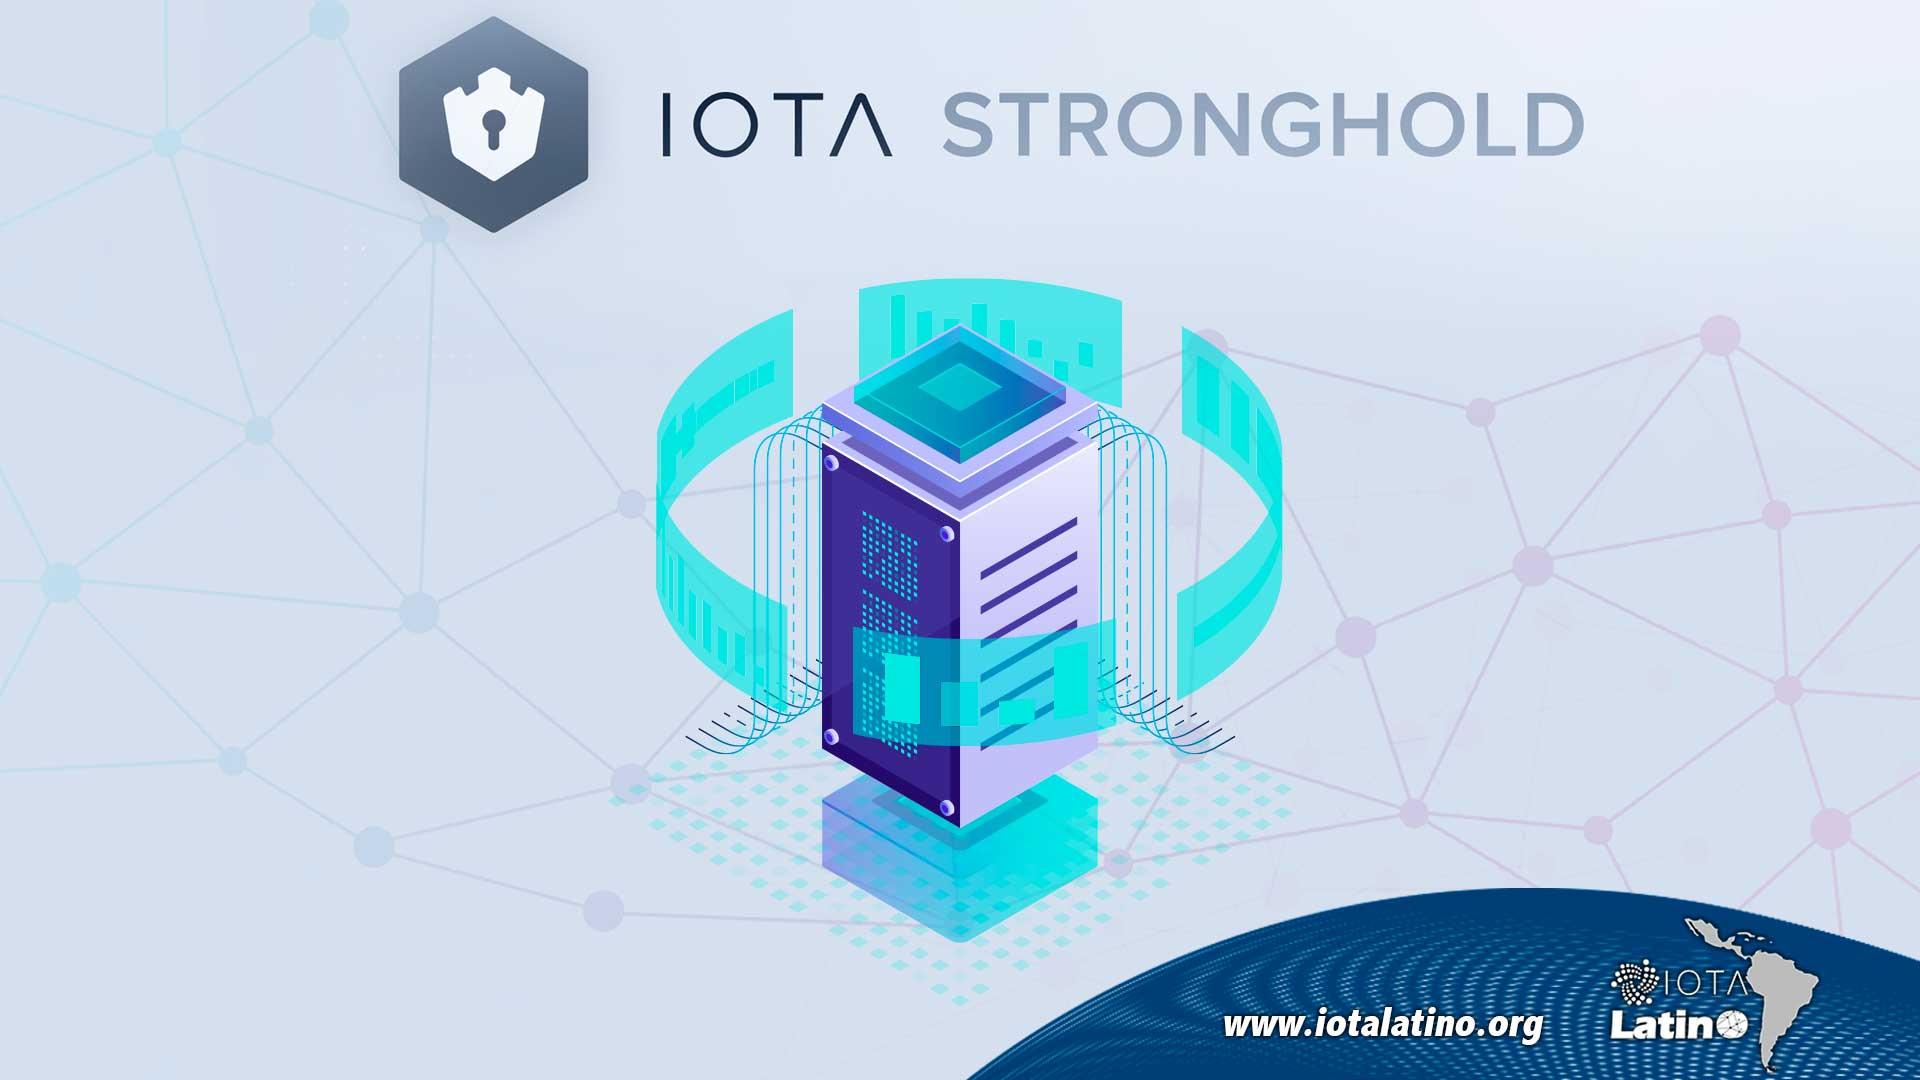 IOTA Stronghold - IOTA Latino